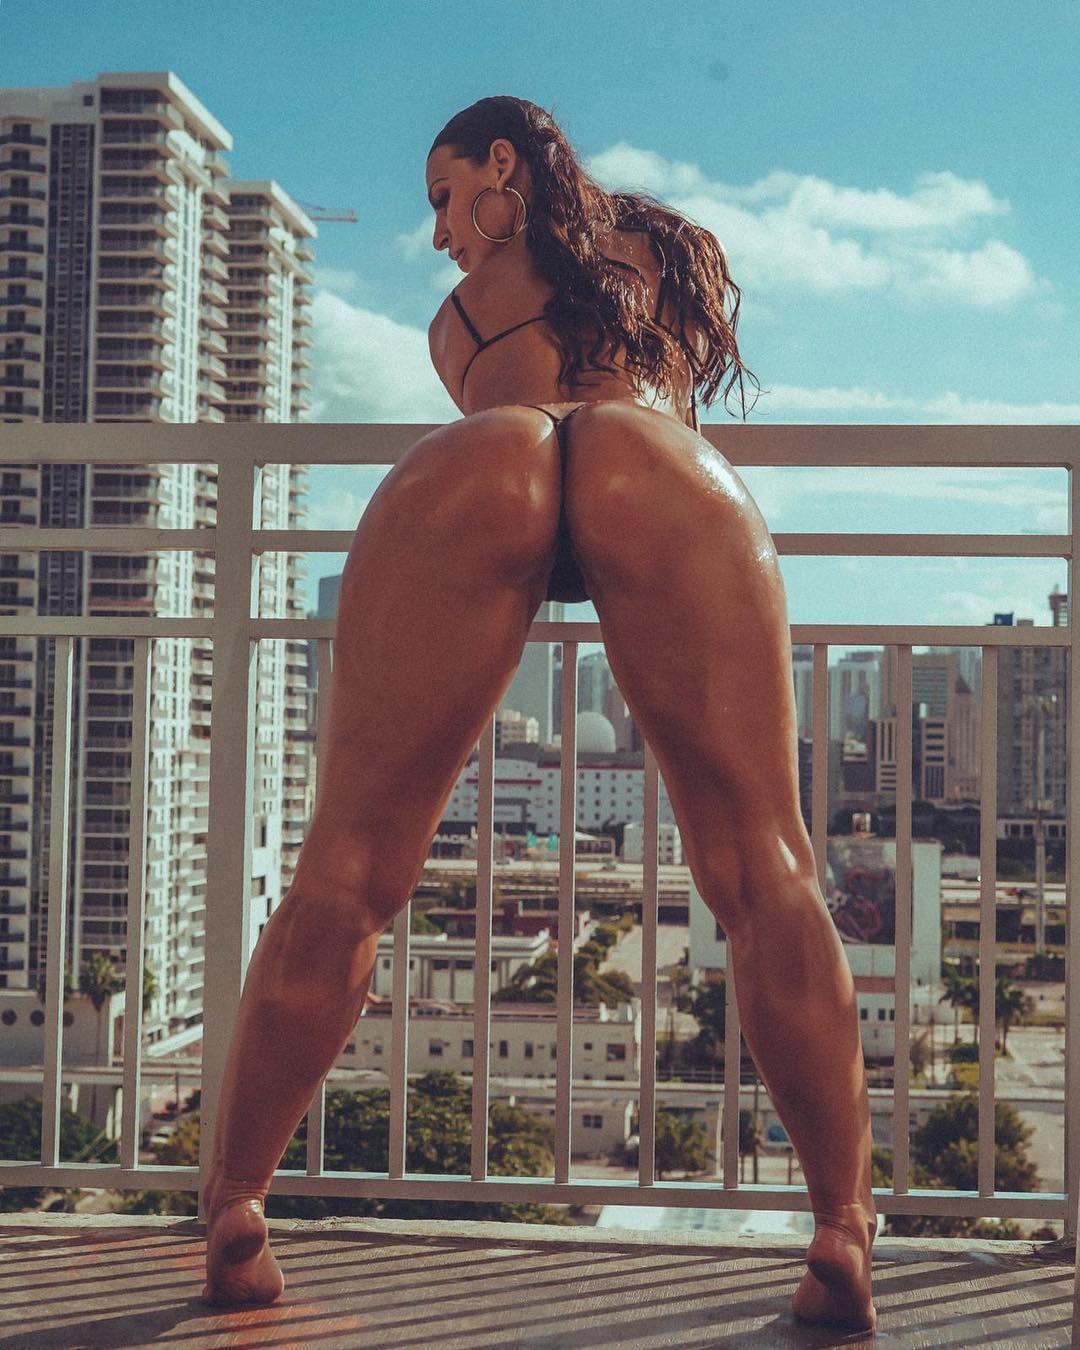 Nadine kerastas nude, sexy, the fappening, uncensored